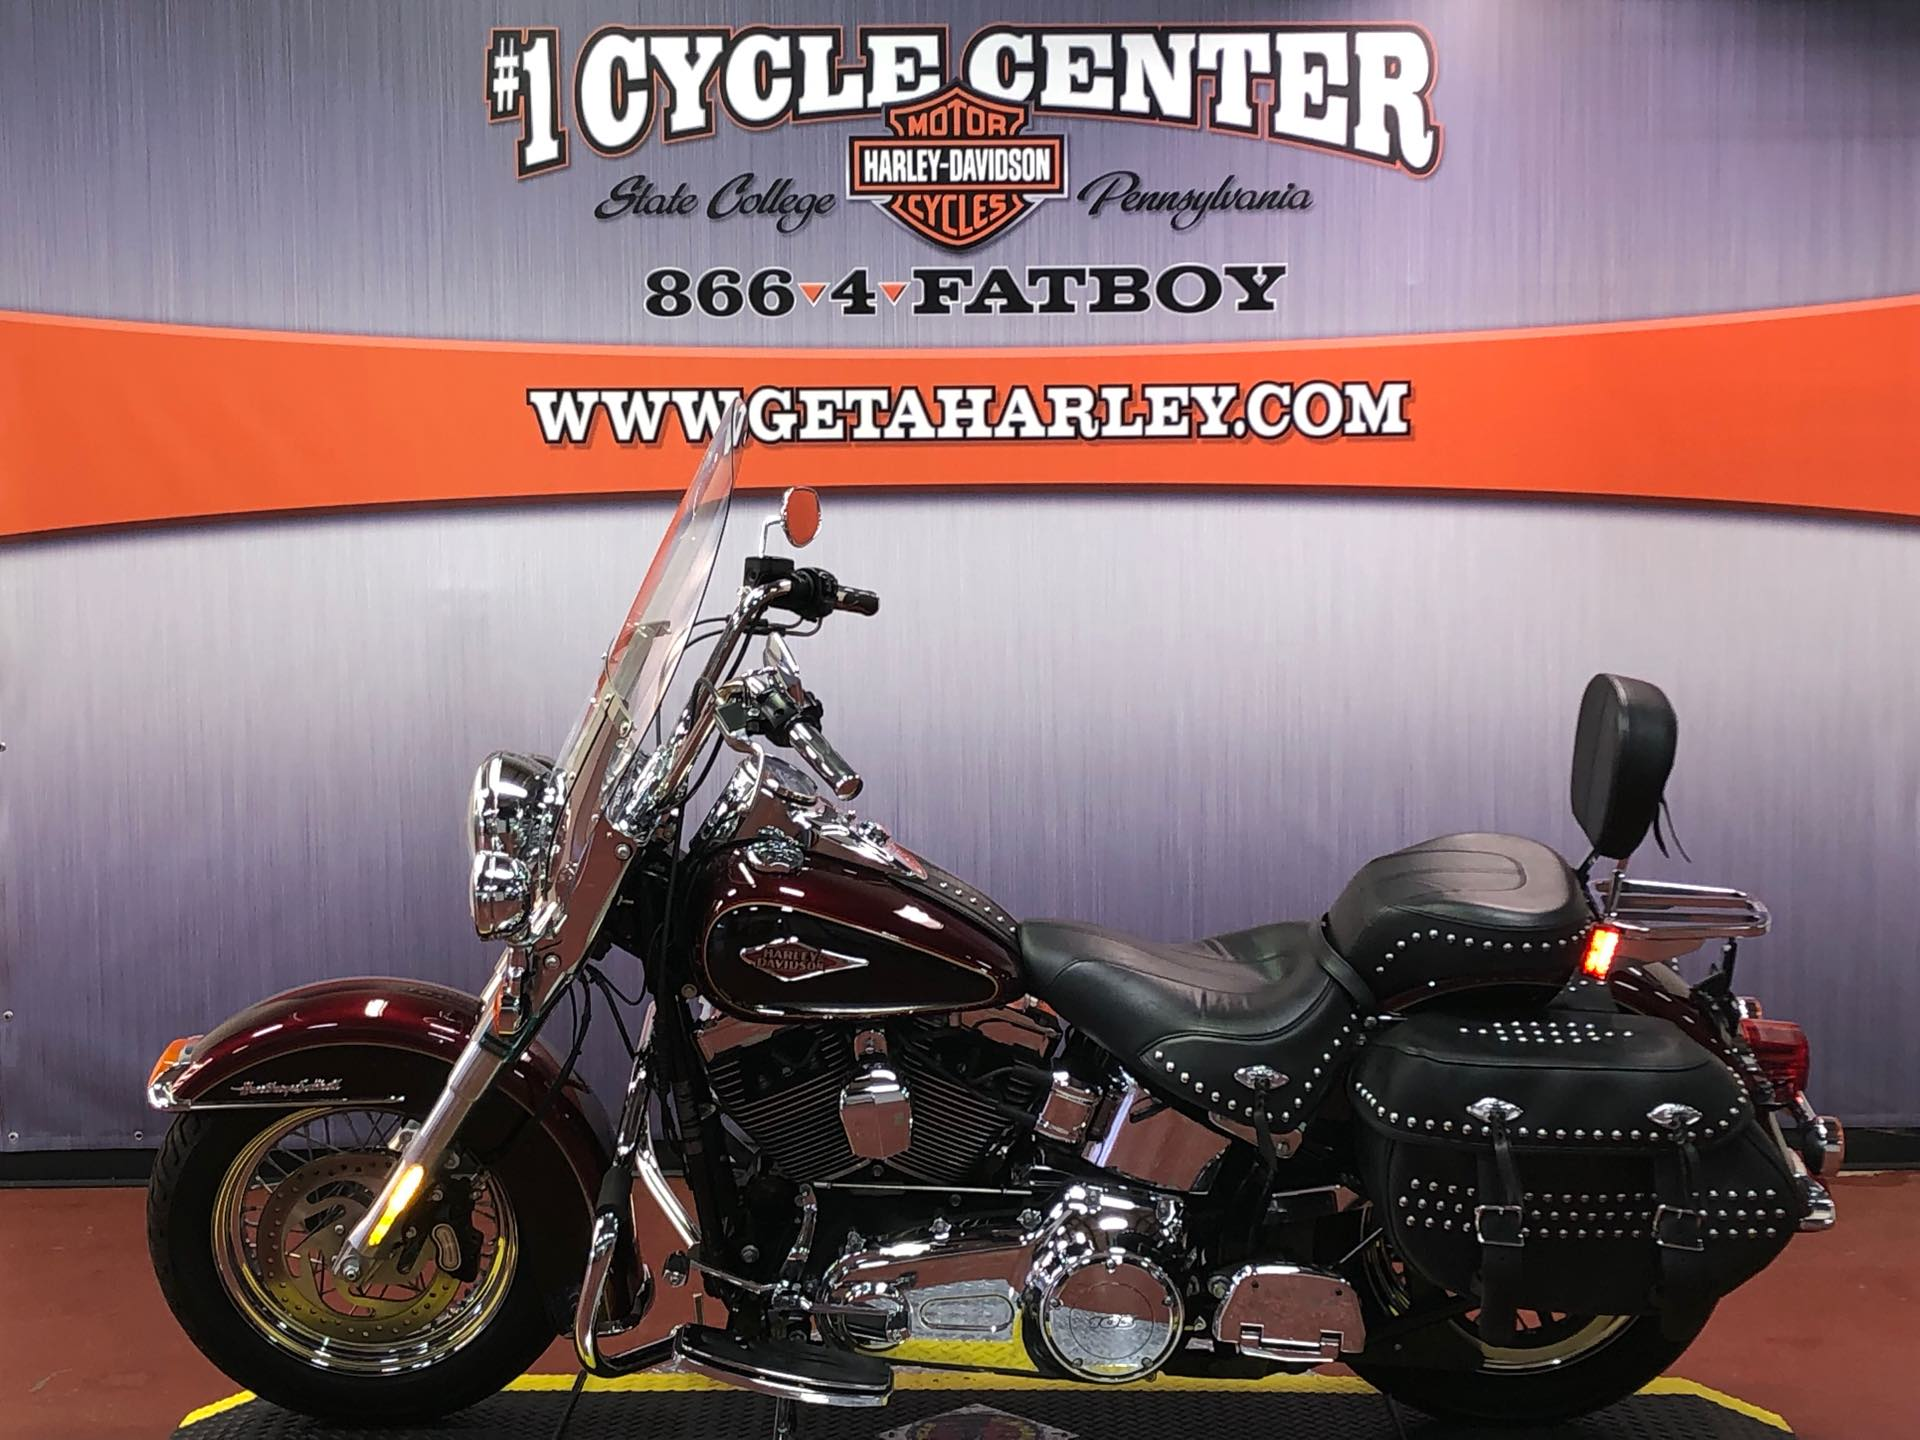 2015 Harley-Davidson Softail Heritage Softail Classic at #1 Cycle Center Harley-Davidson